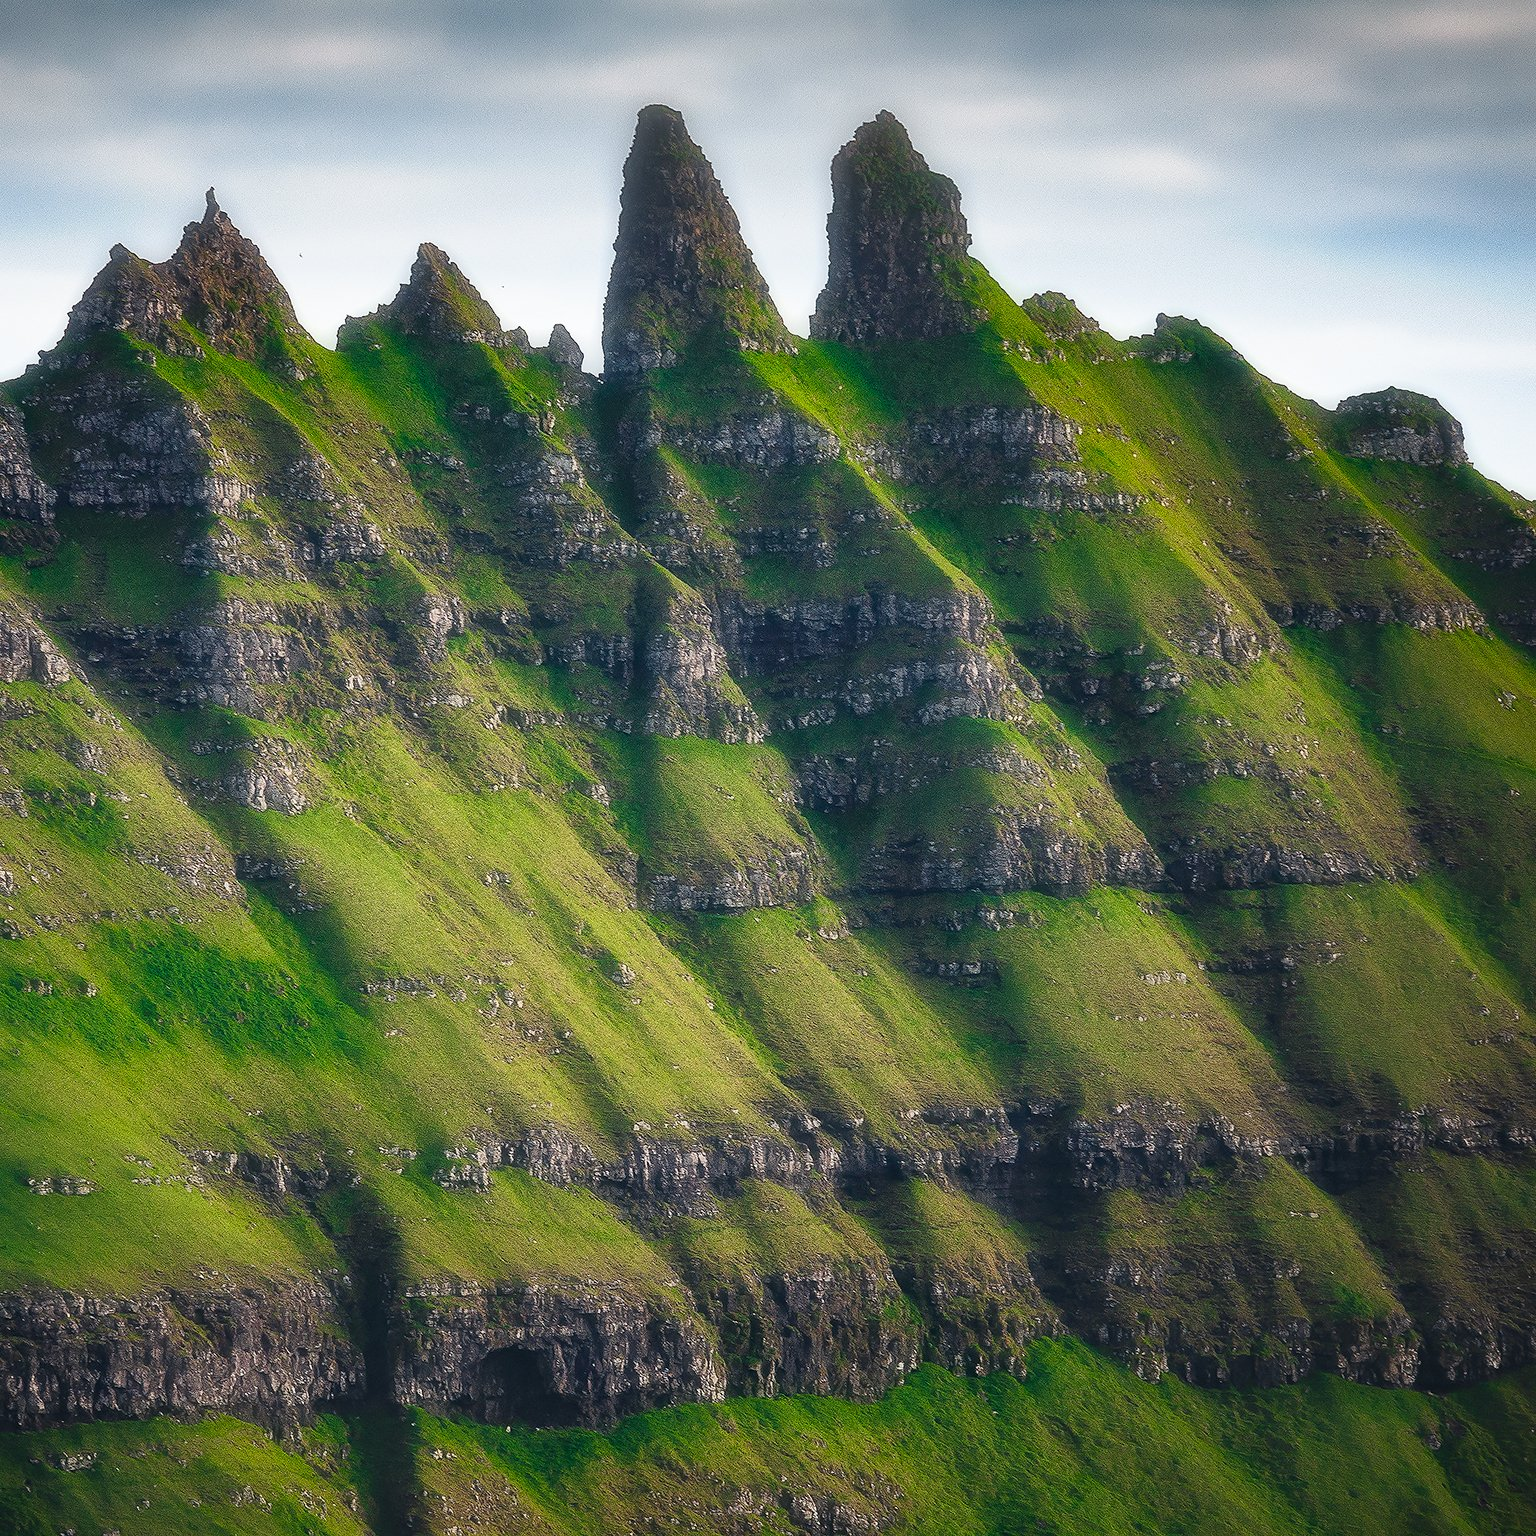 faroe, tindholmur, nikon, landscape, texture, basalt, layers, Csomai David